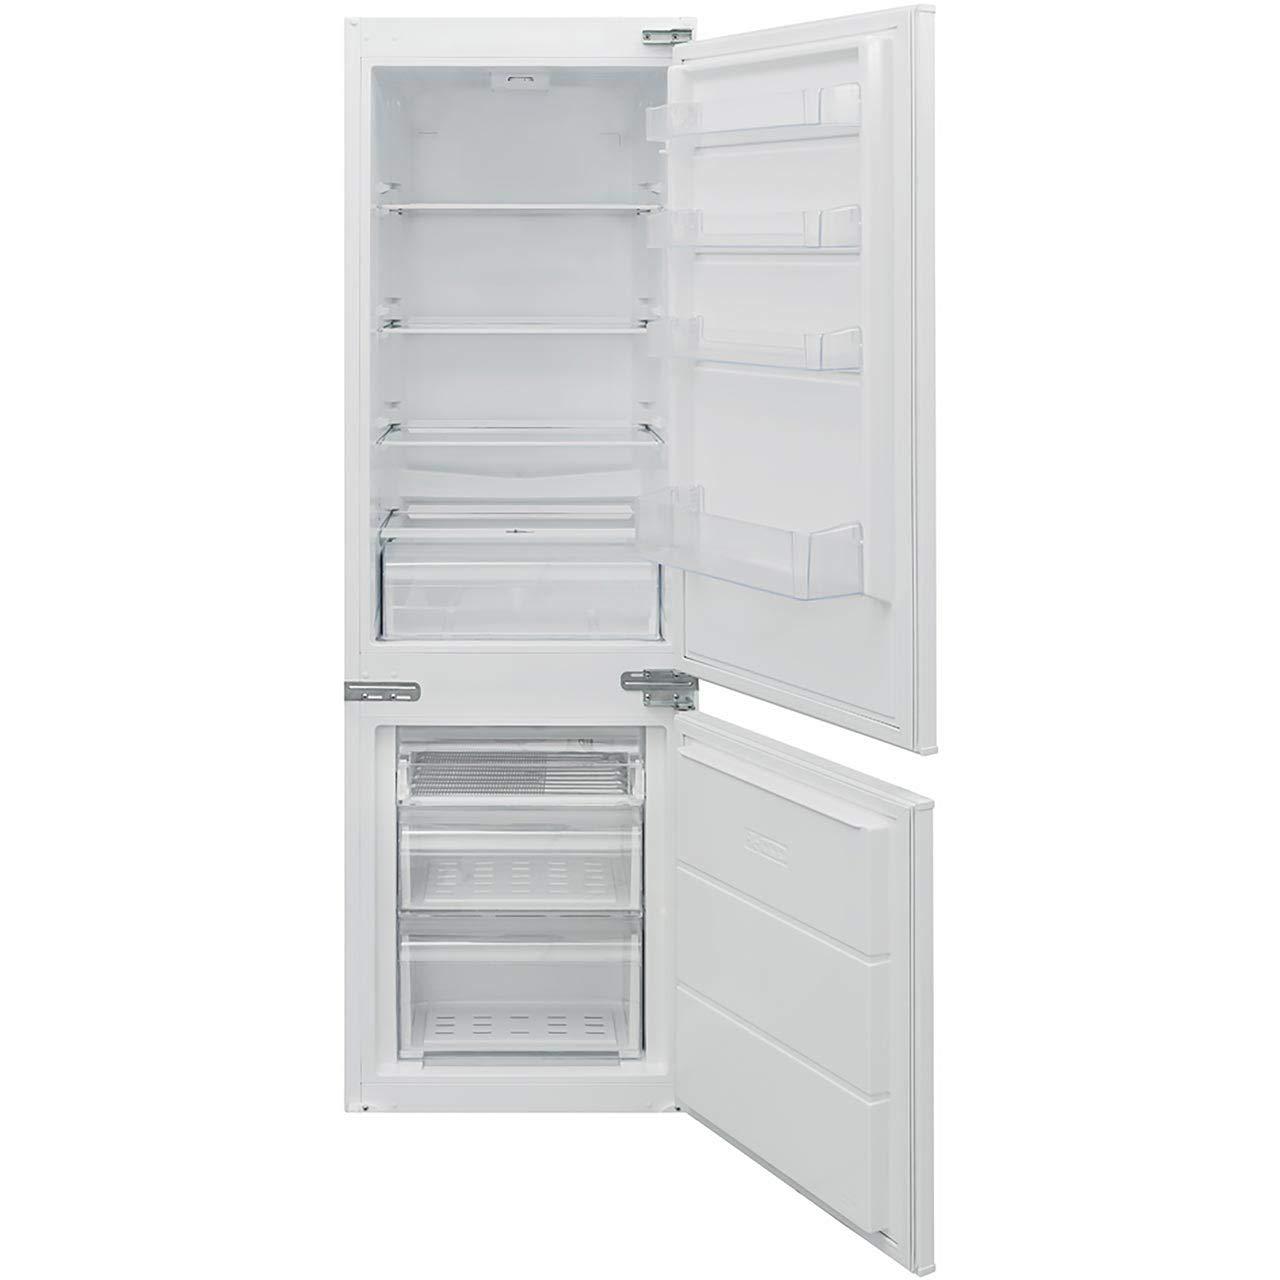 Baumatic BRCIS3180E Built-In Fridge Freezer -White